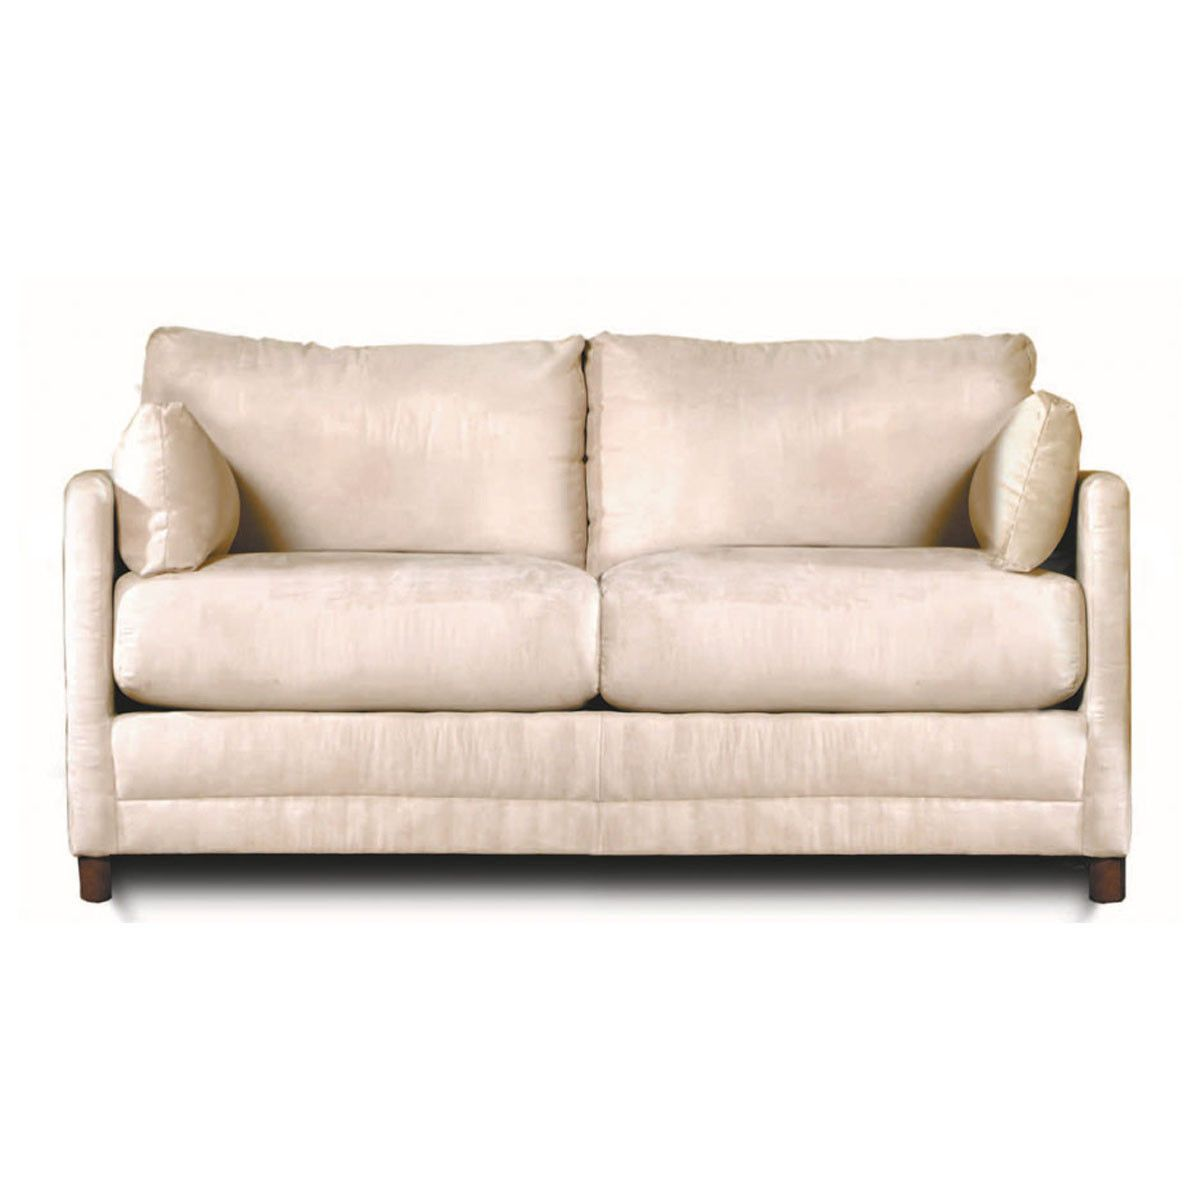 bianca futon sofa bed review funky small sofas uk jennifer sleeper softee full and